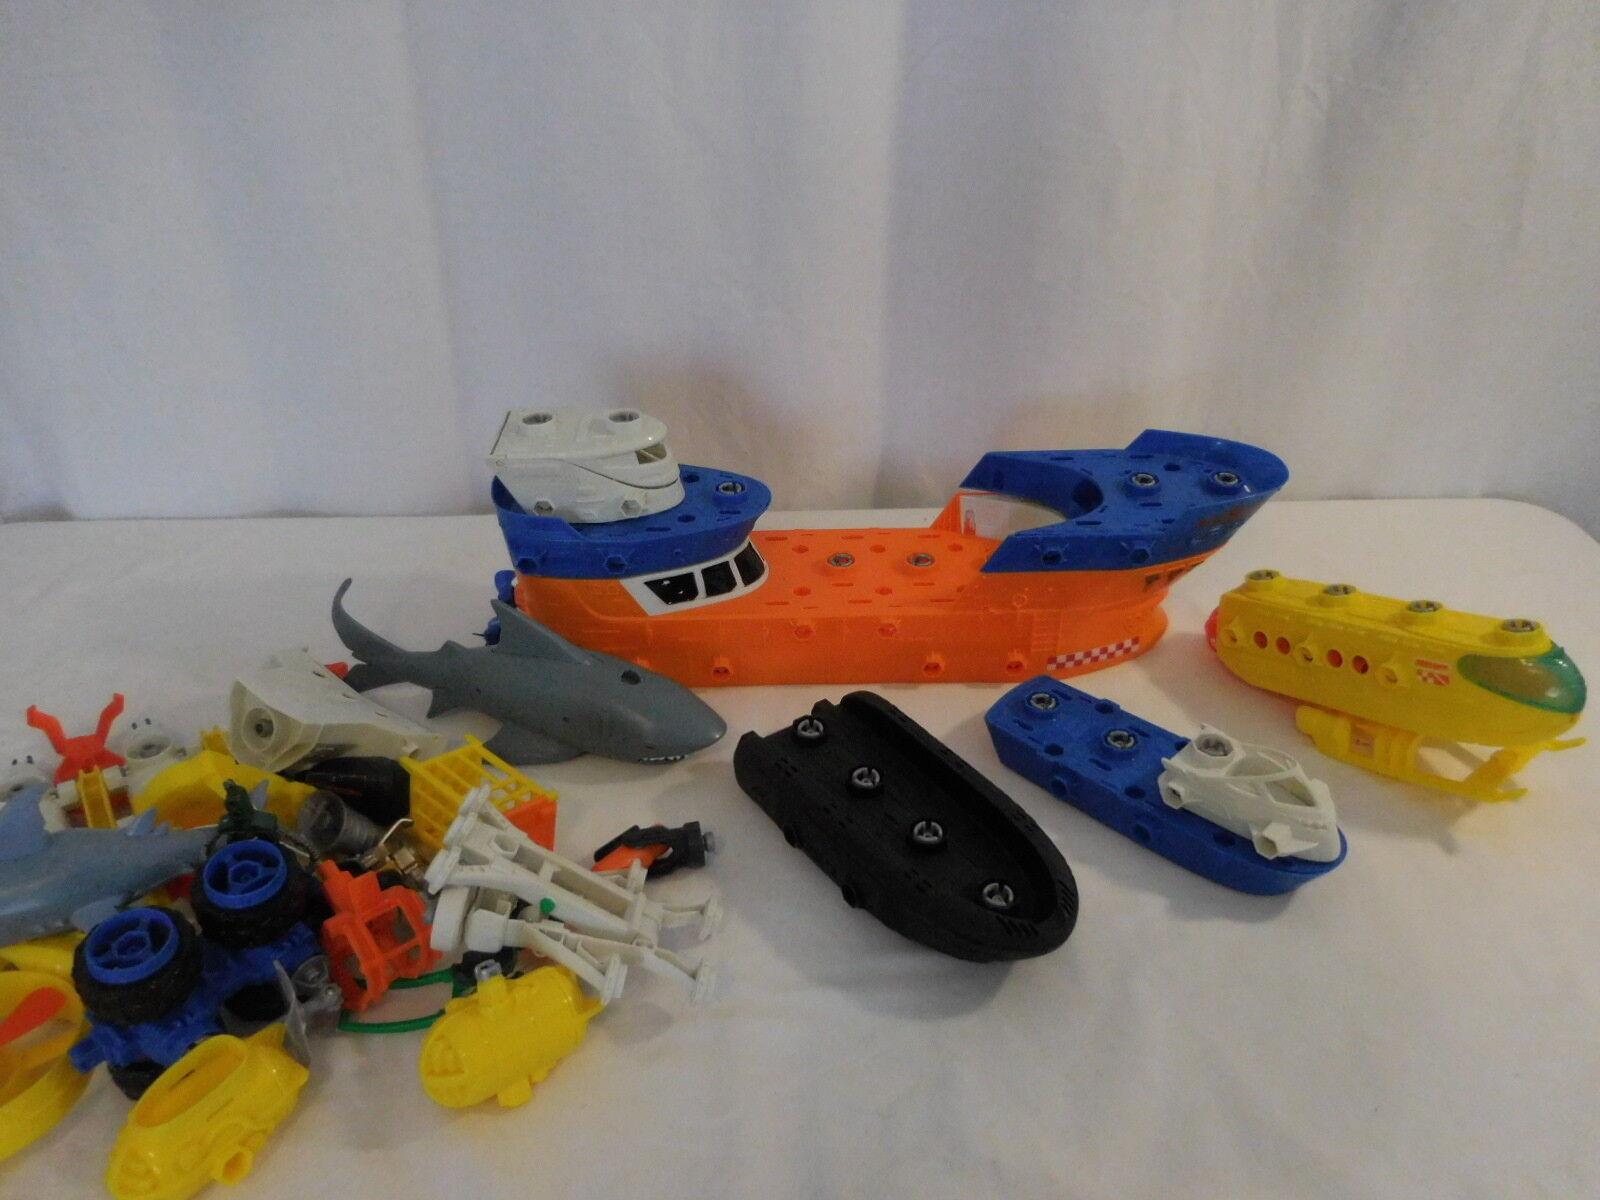 Matchbox Rig Shark Ship Mega Rig Matchbox Rolls Floats in water Build your own Adventure 45002c